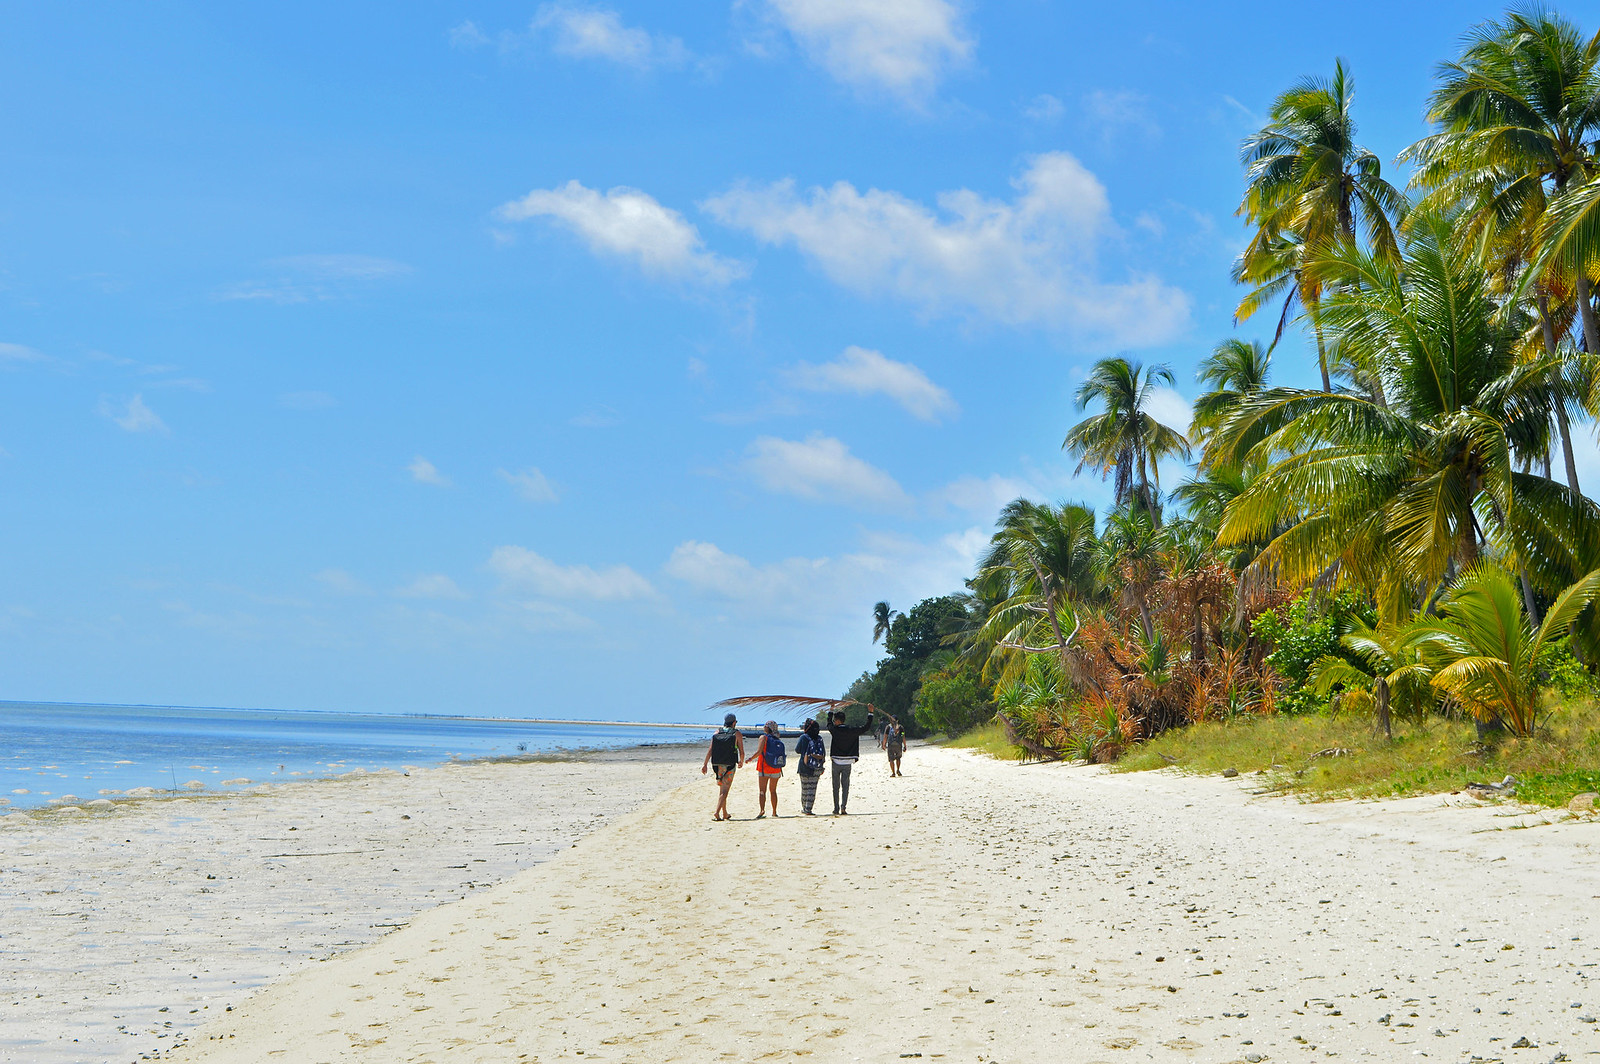 Hoga island